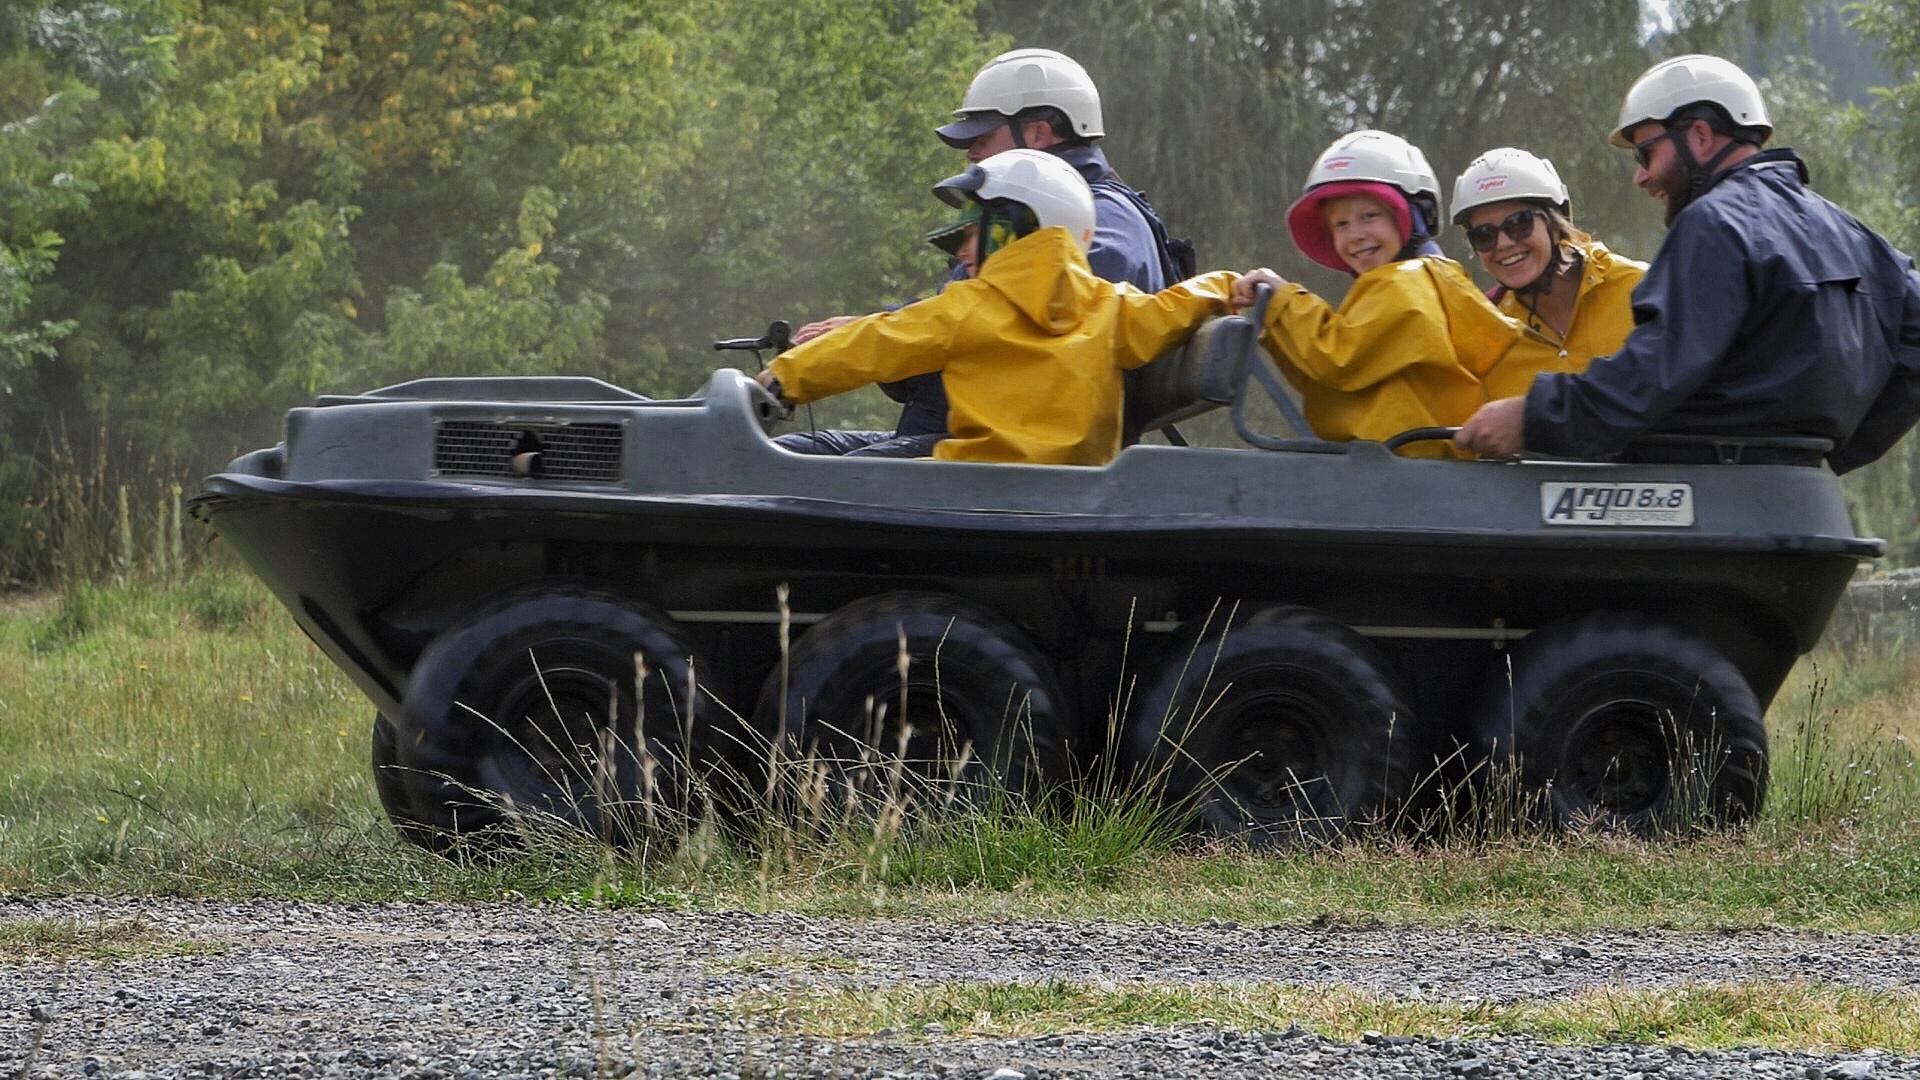 The Argo - wet and wild fun